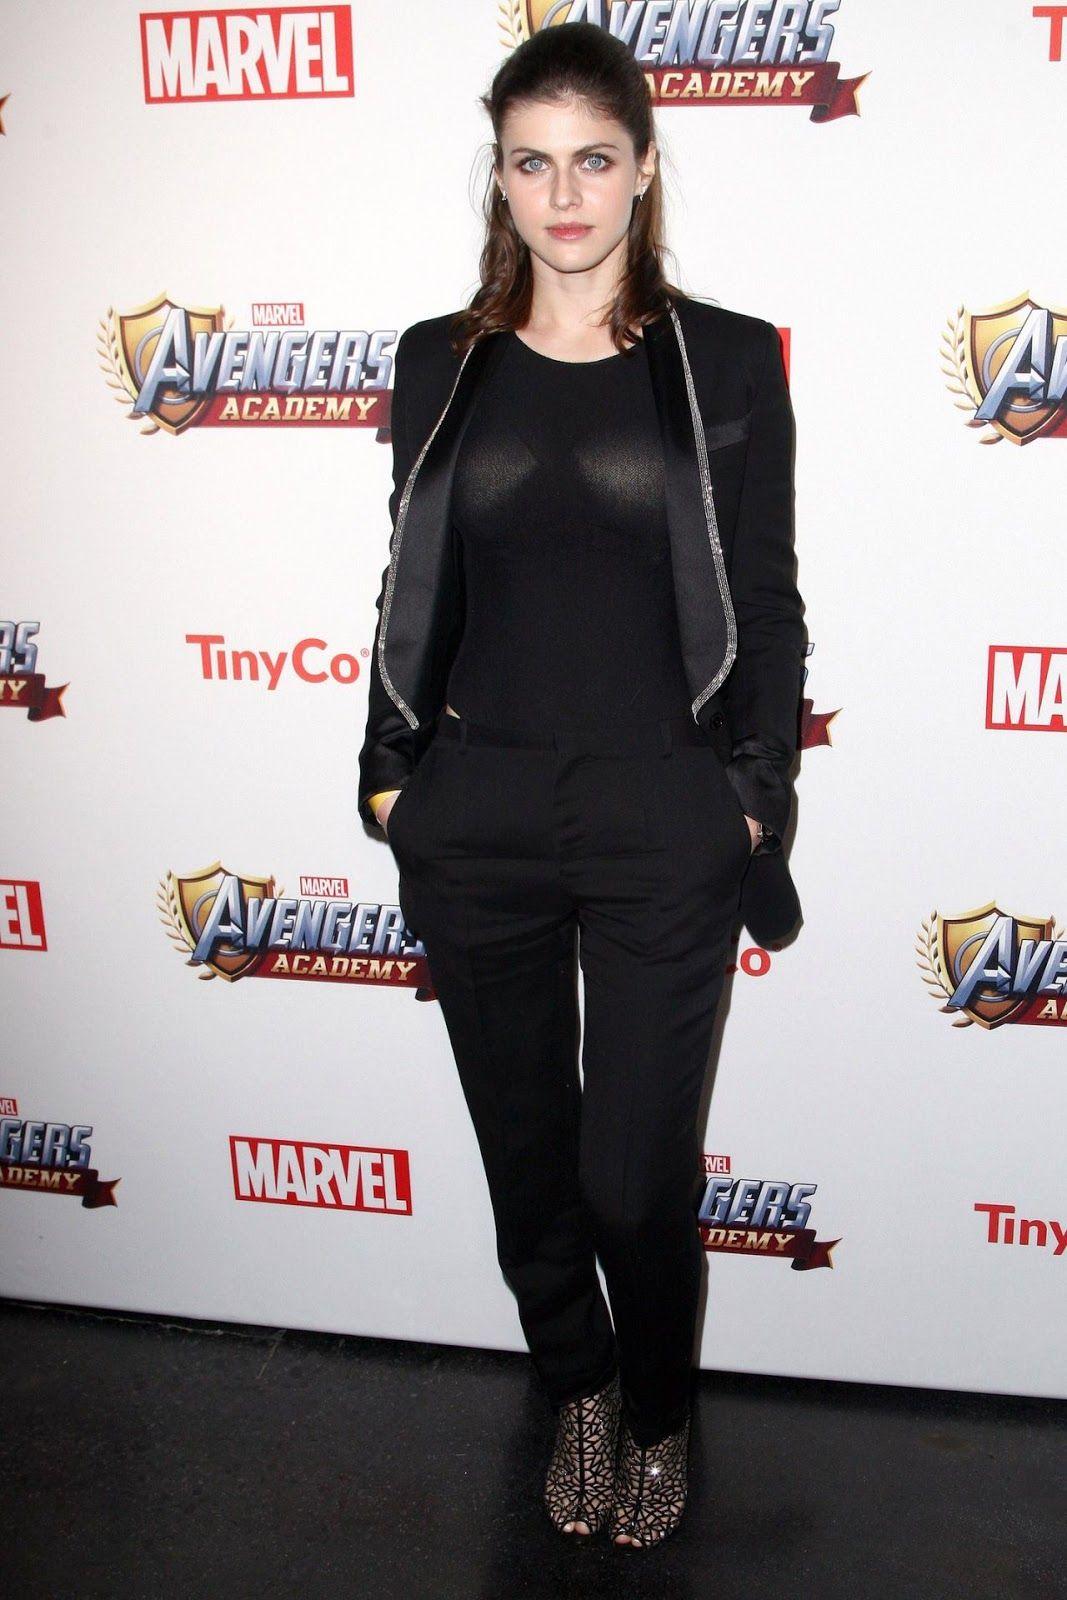 celebstills: Alexandra Daddario - Party Marvel Avengers akadémie v Los Angeles, CA